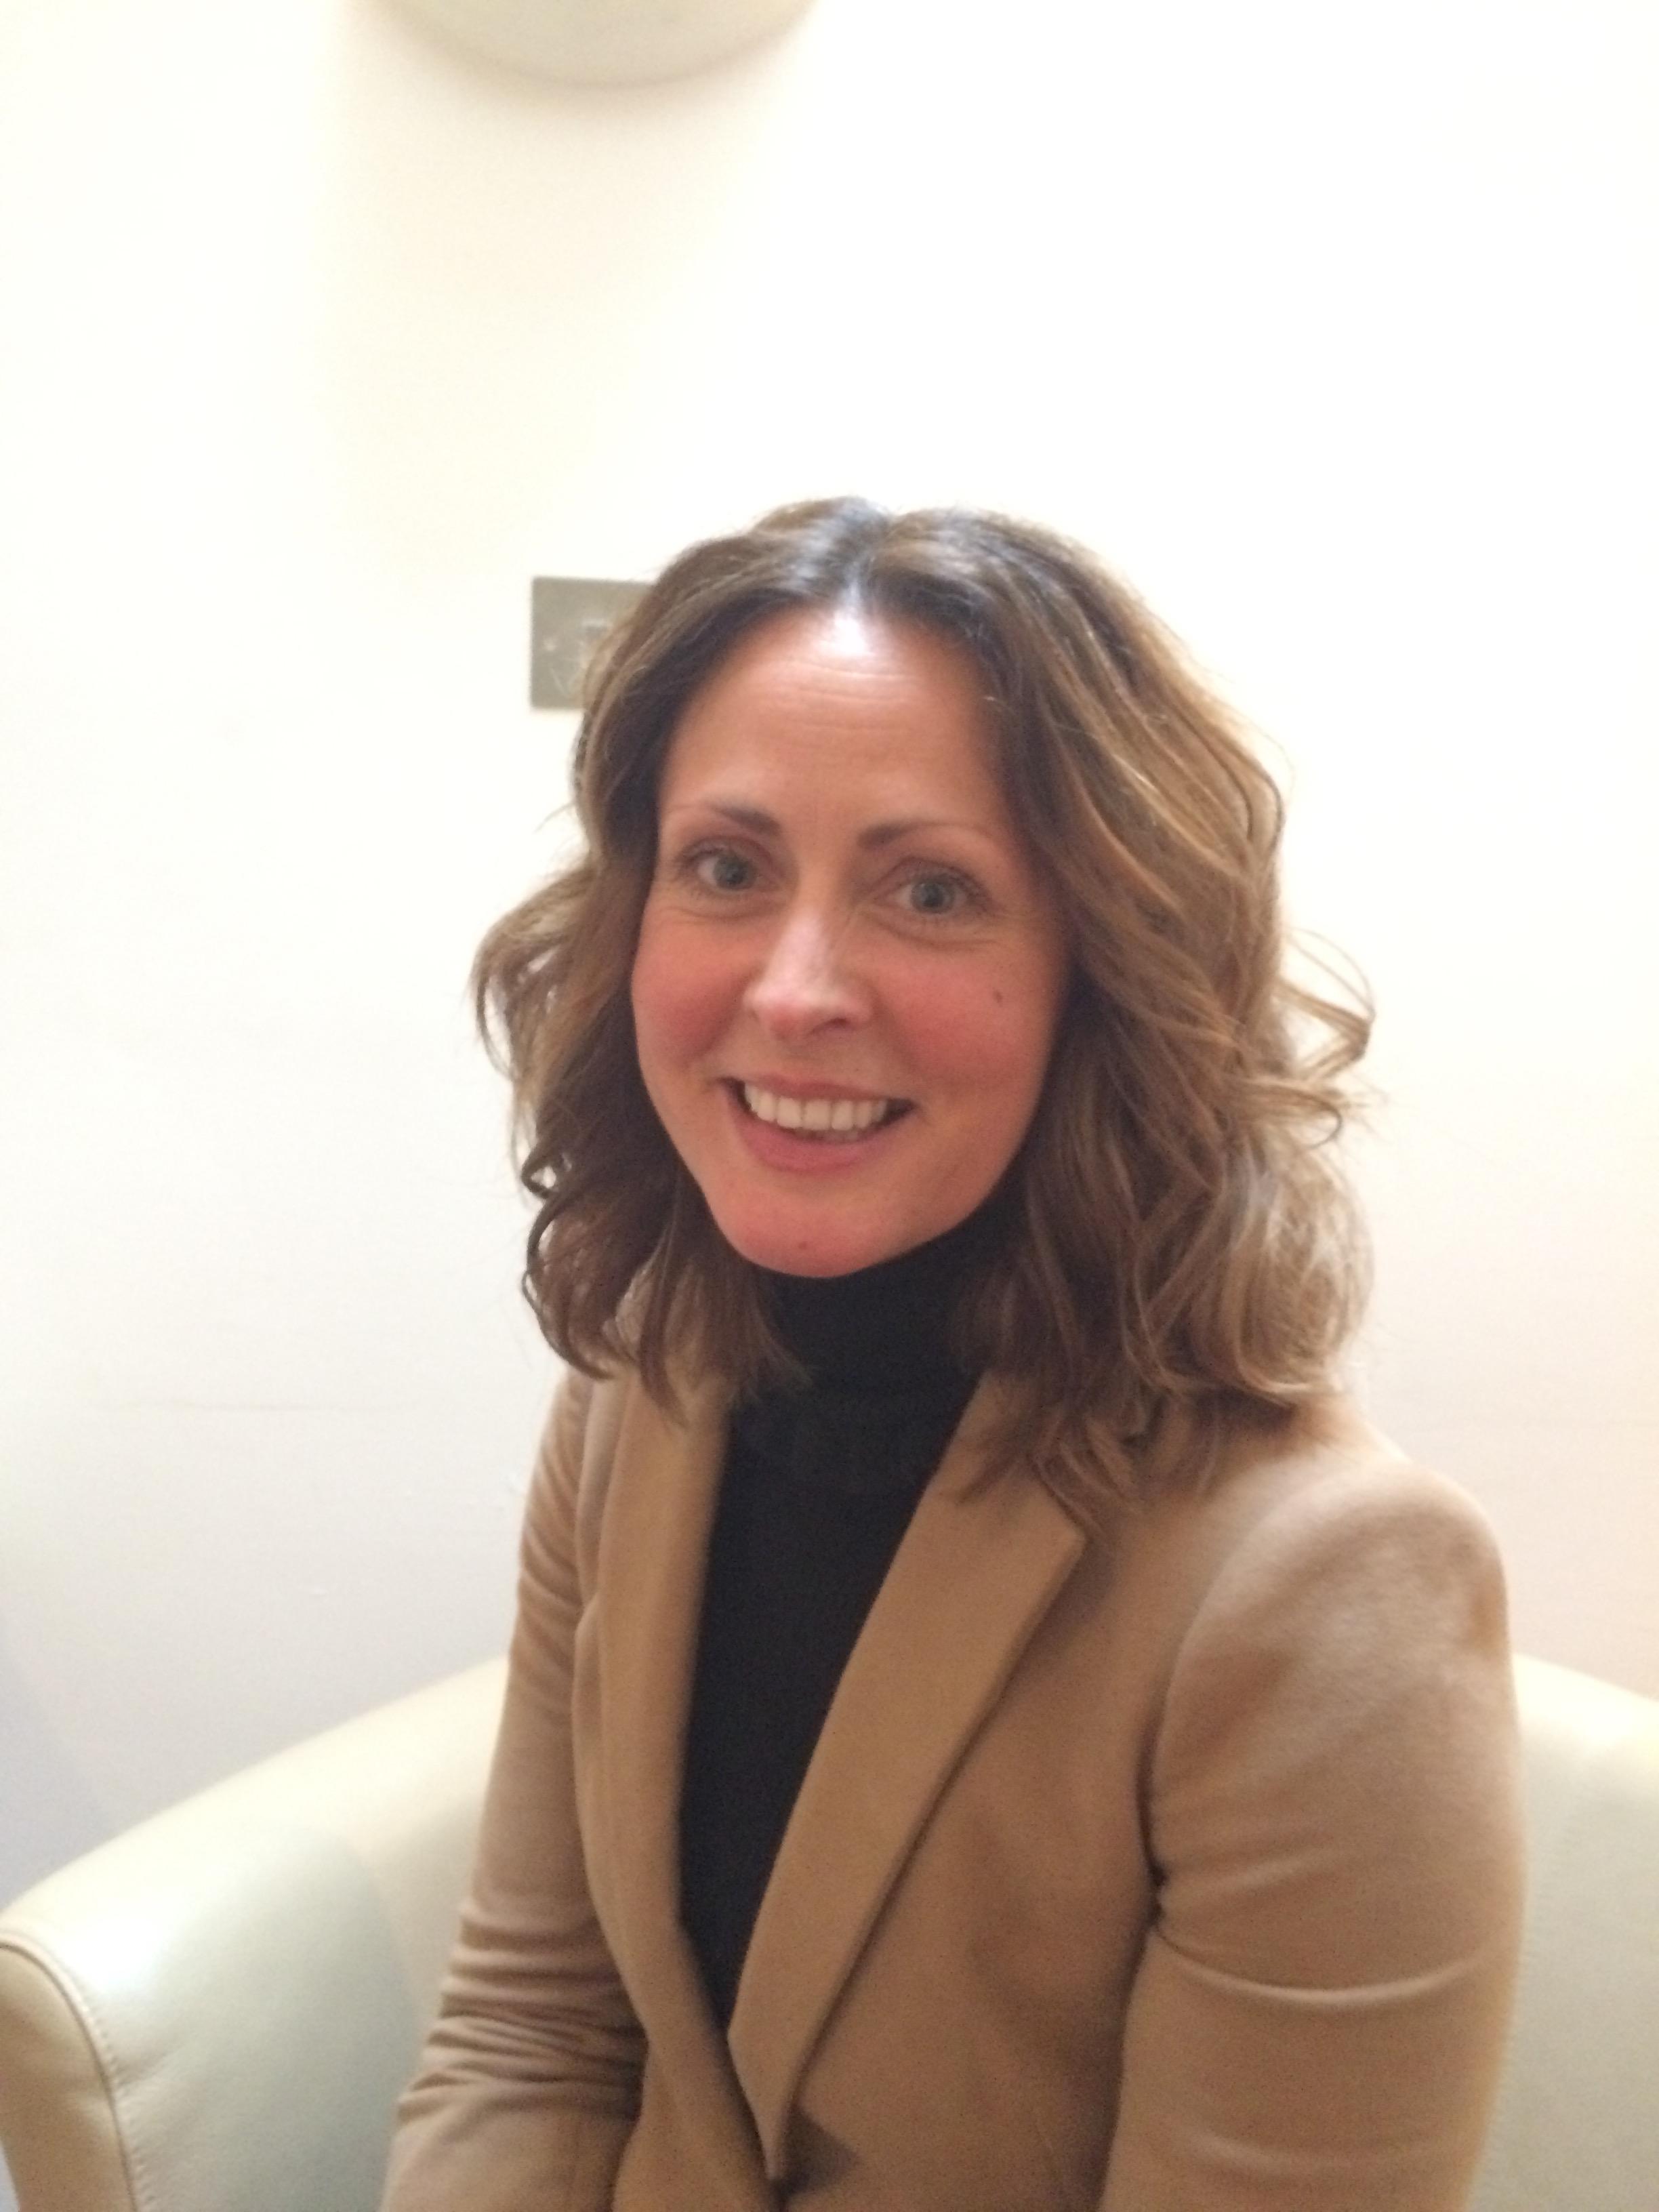 Alison Rodgers